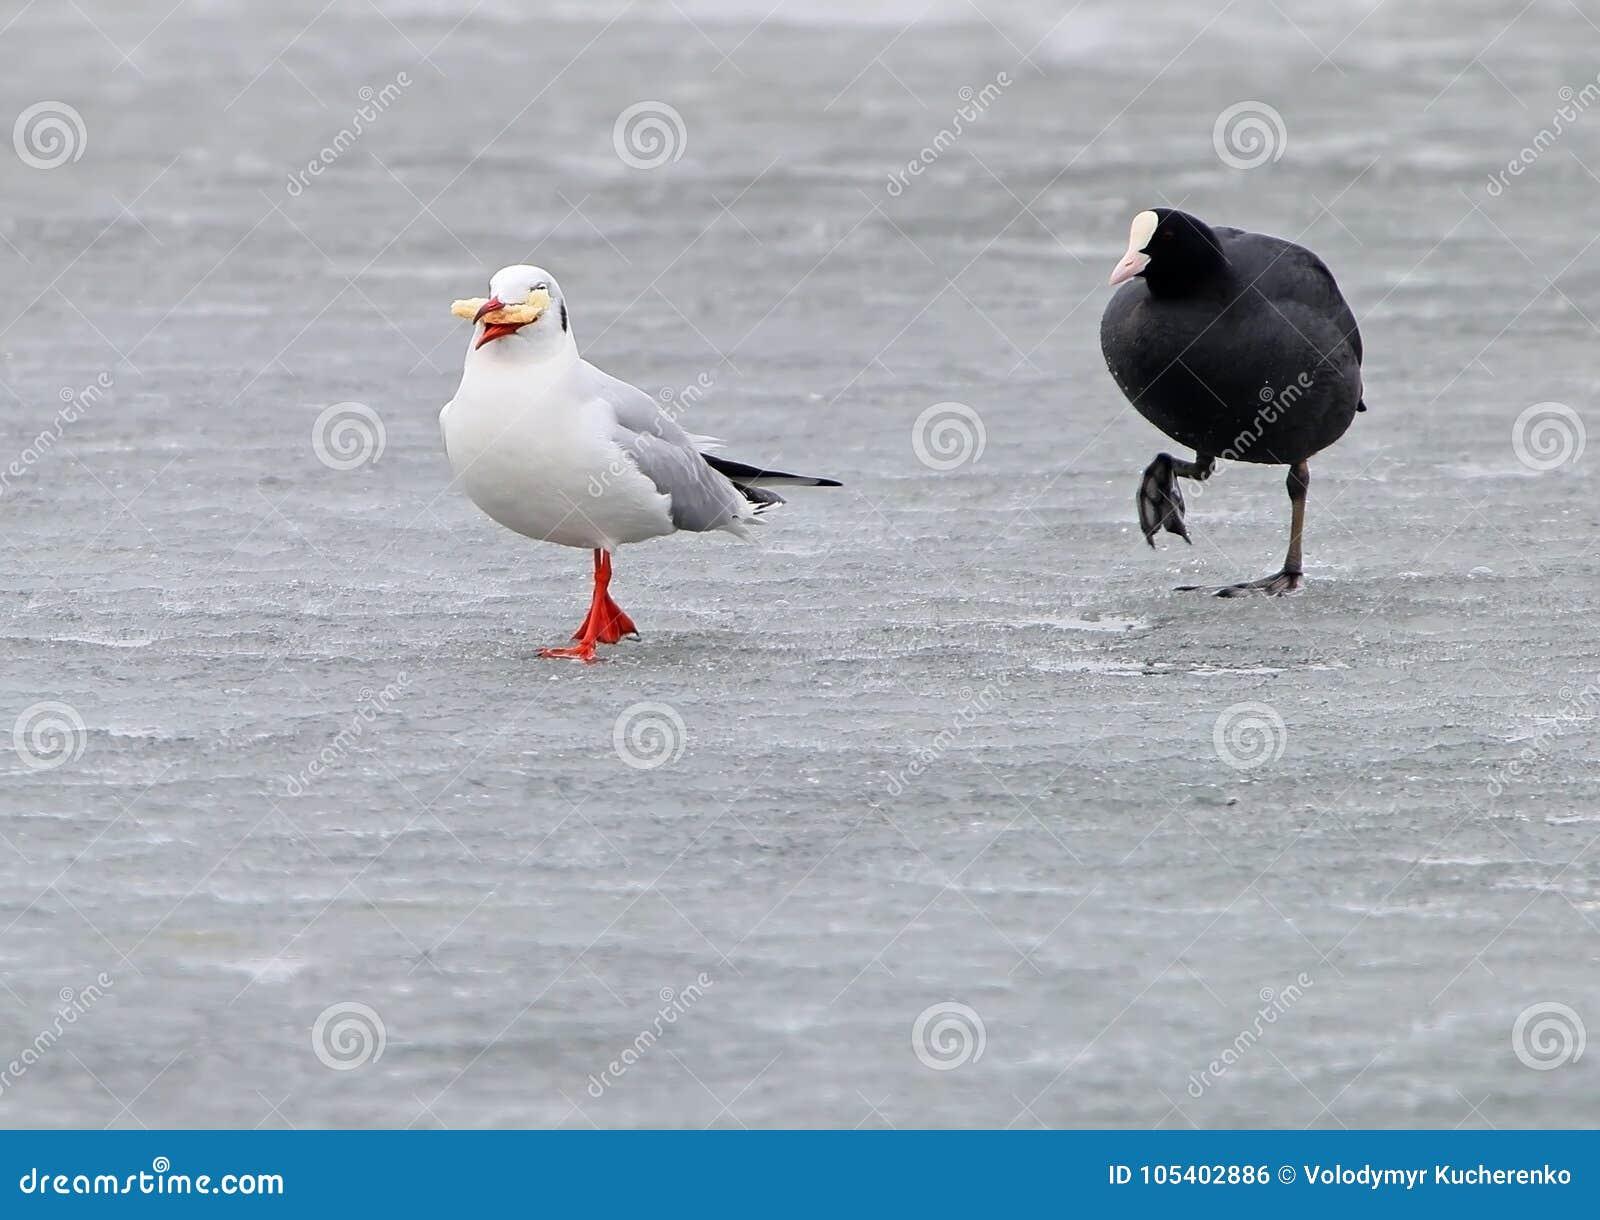 Download Η ευρασιατική φαλαρίδα χαράζει στον πάγο Seagull με το ψωμί Στοκ Εικόνες - εικόνα από άγριος, κυνήγι: 105402886